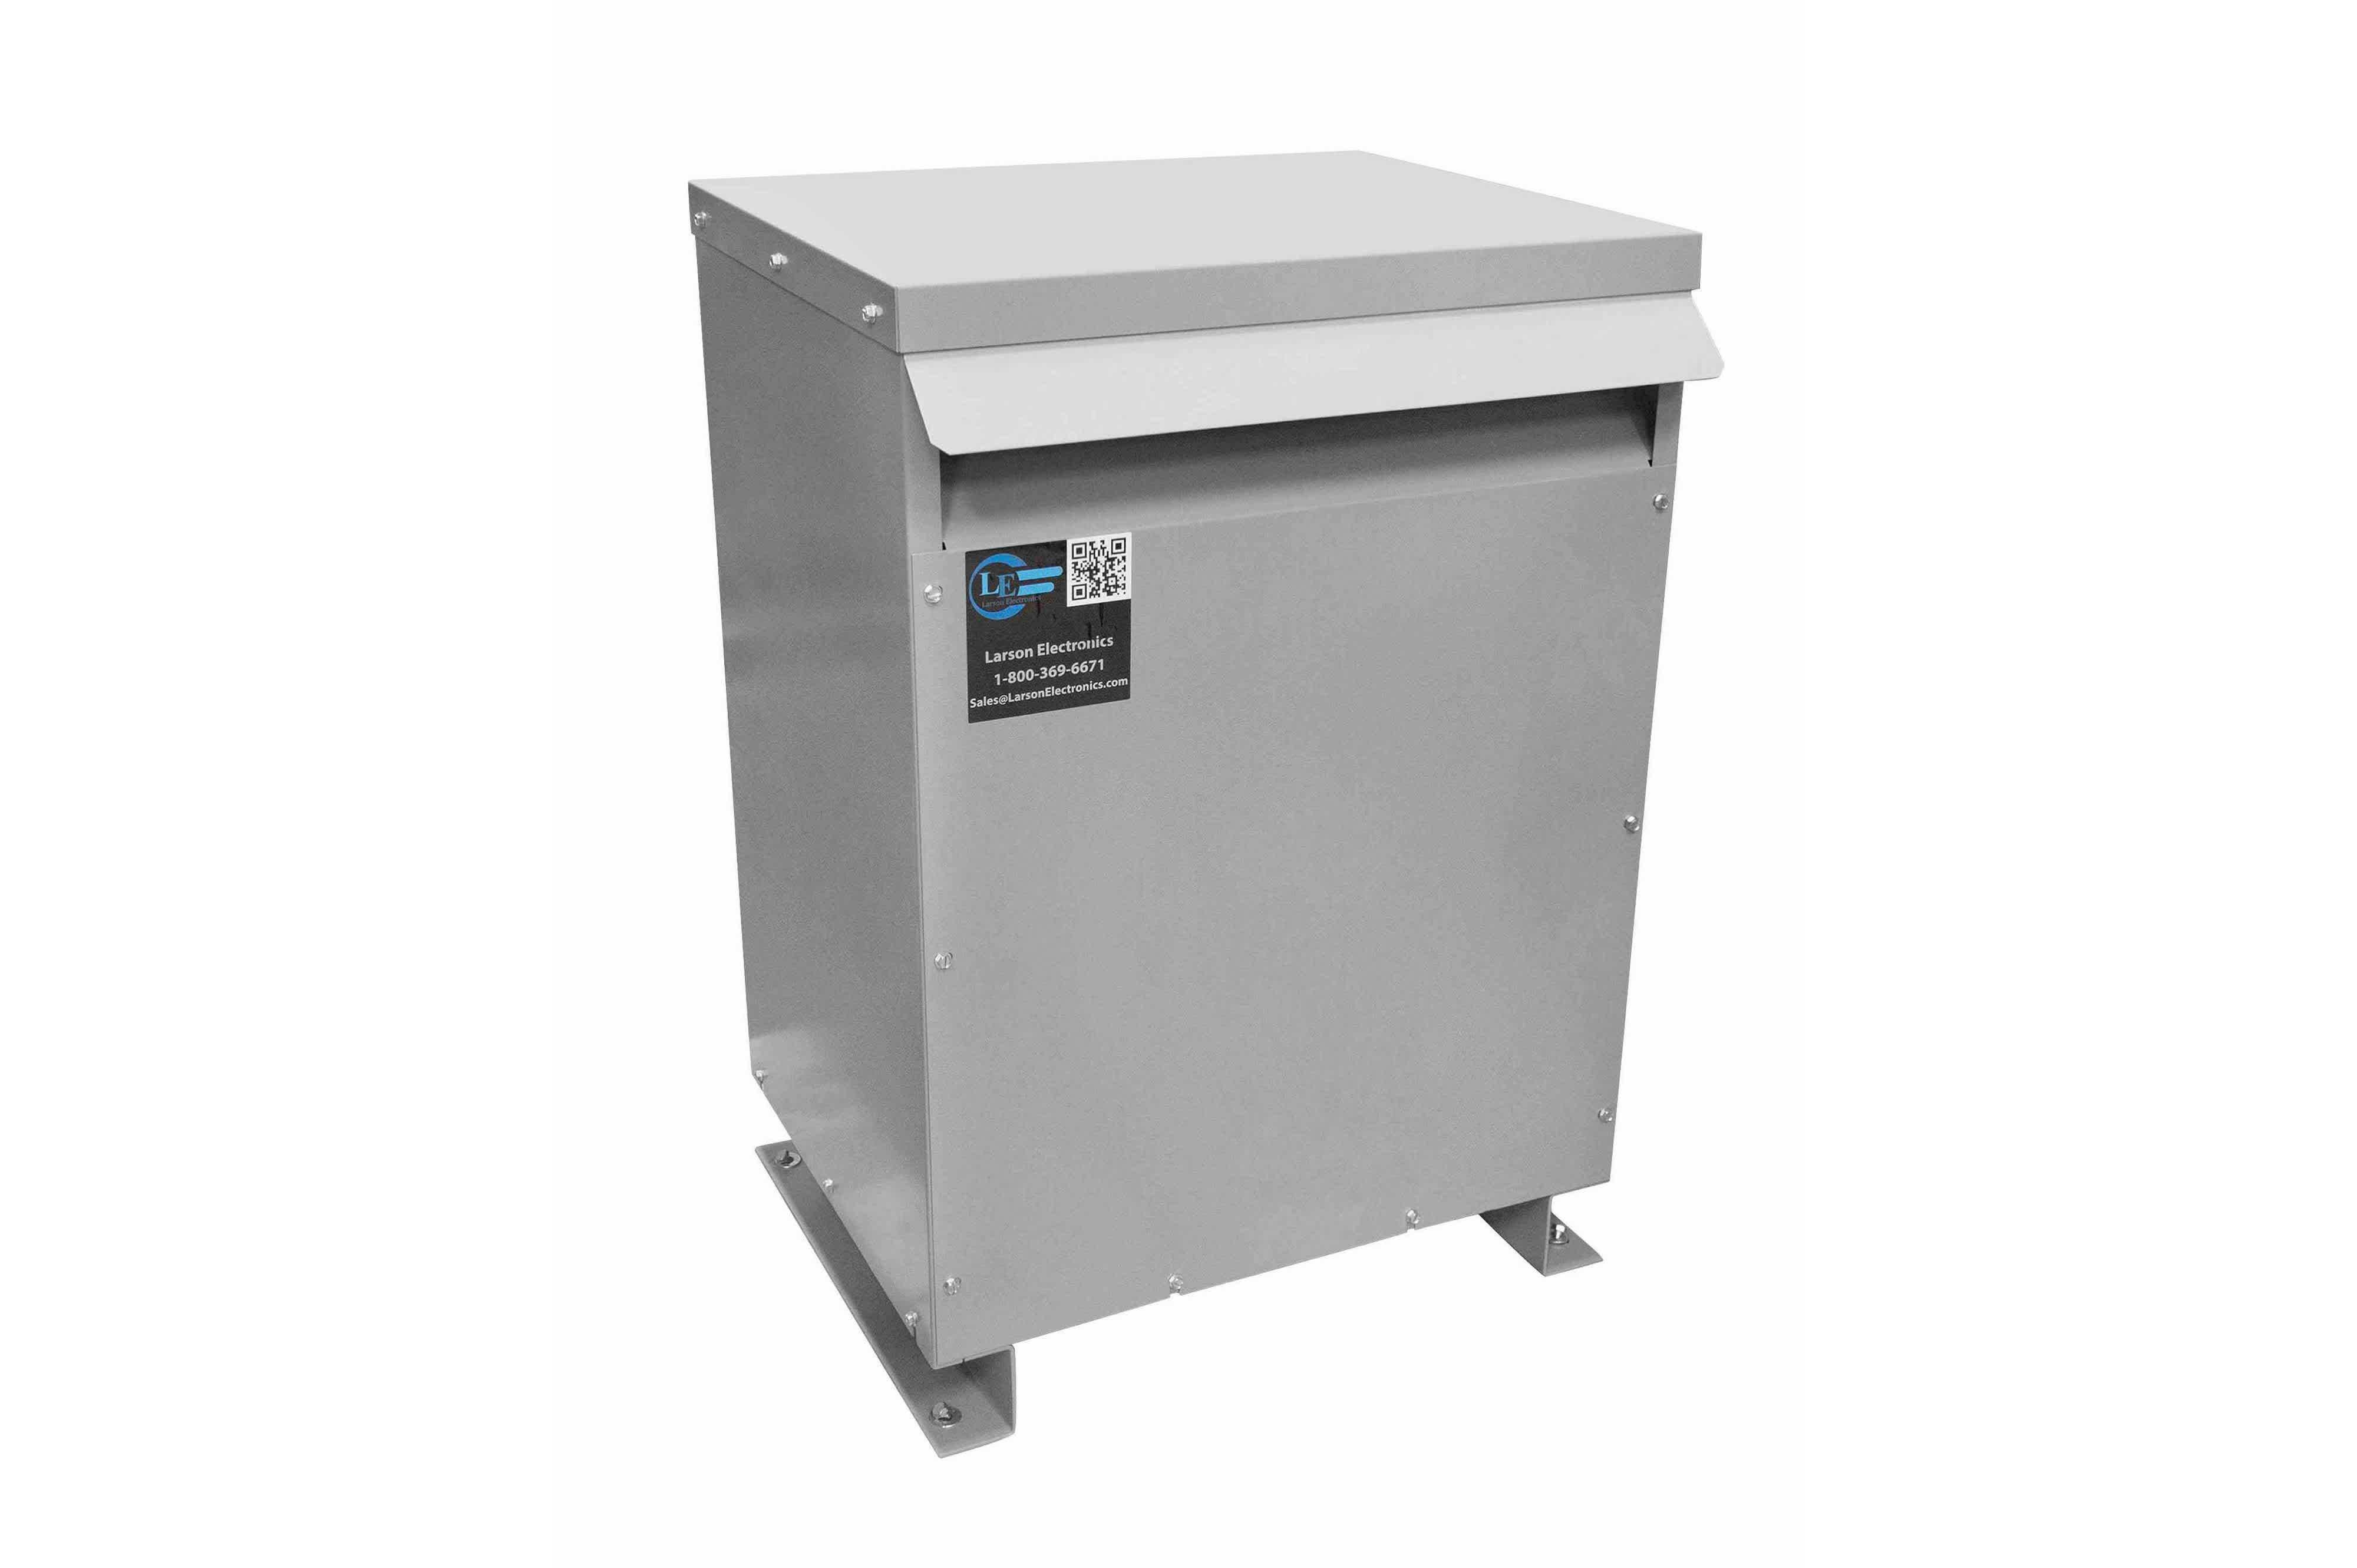 60 kVA 3PH Isolation Transformer, 460V Wye Primary, 415Y/240 Wye-N Secondary, N3R, Ventilated, 60 Hz